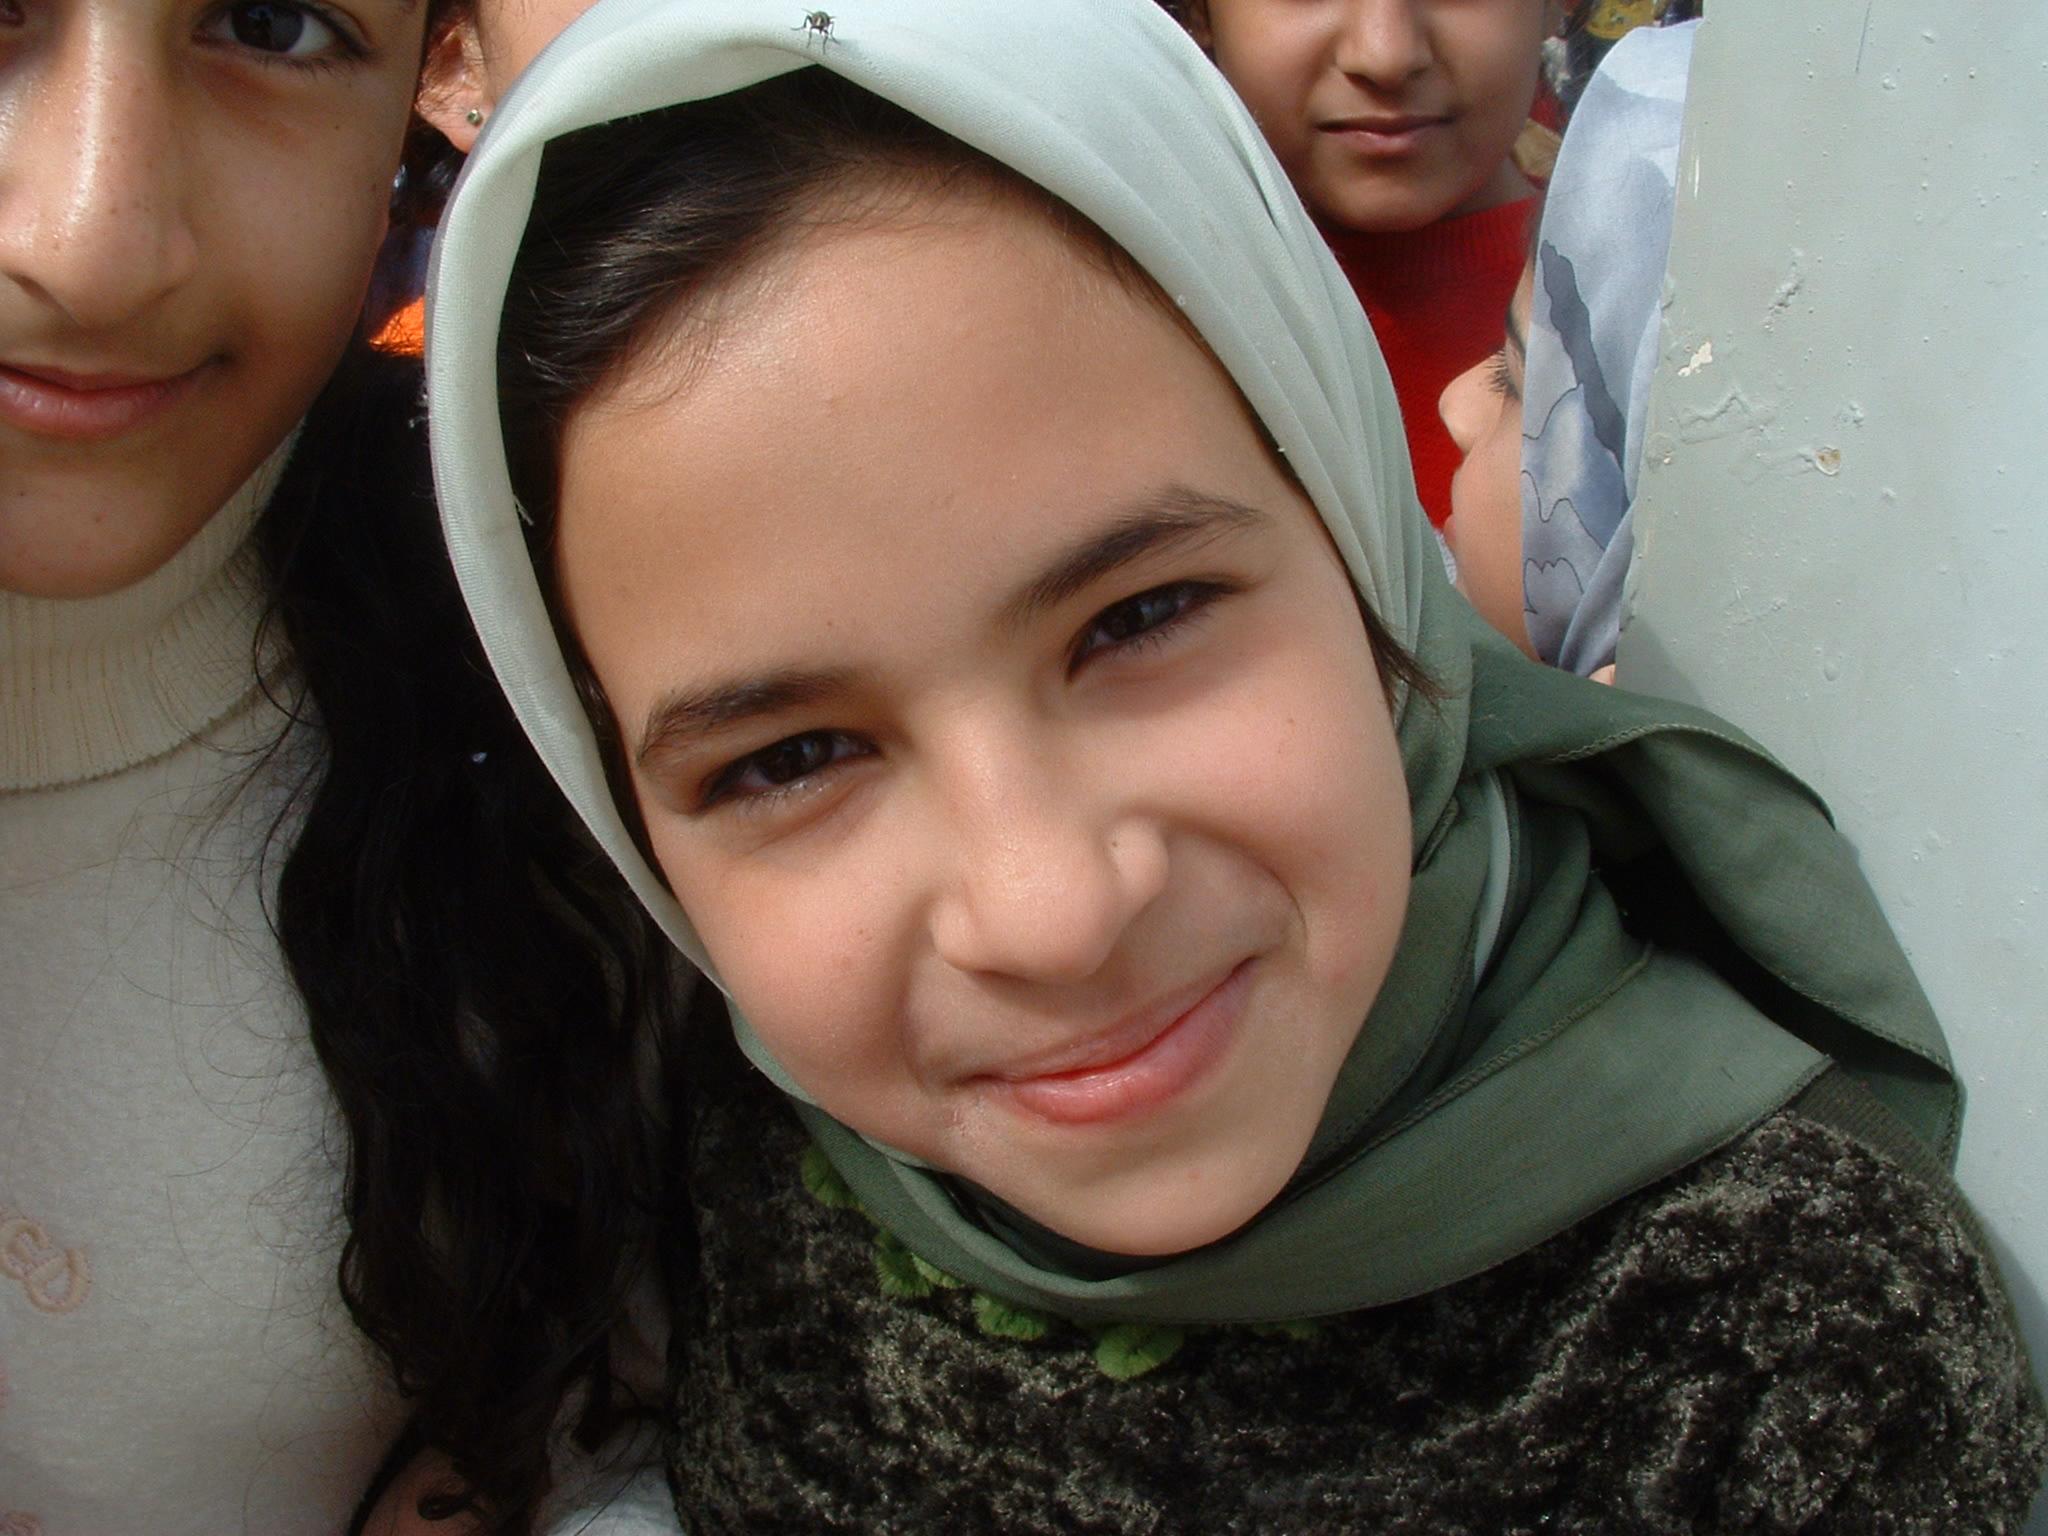 Iraq sex girls photo gallery opinion you